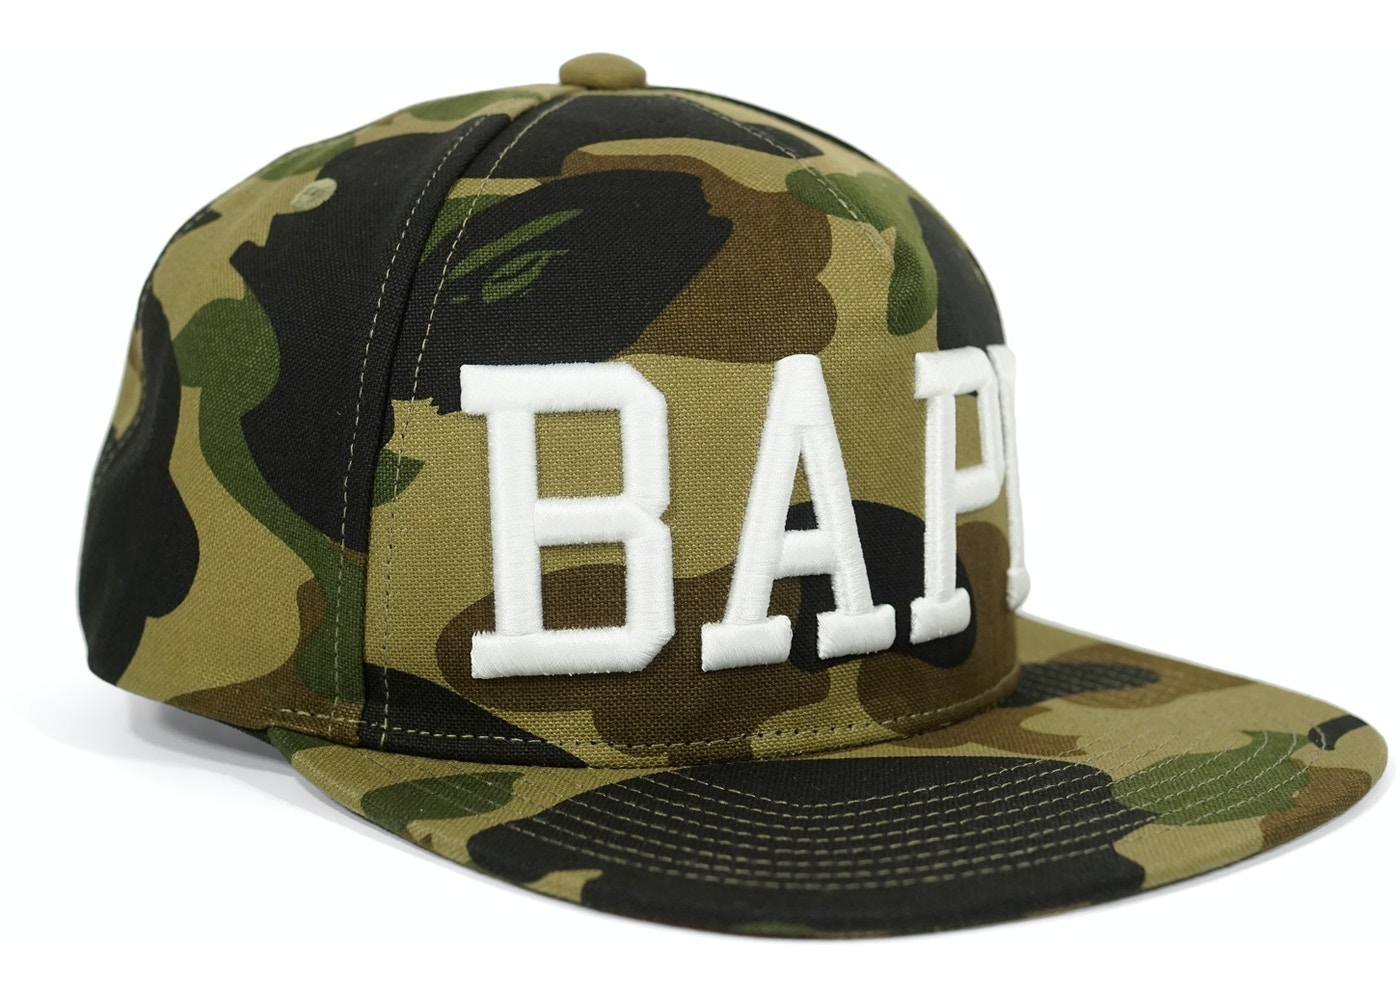 dbdb7188b6dda BAPE 1st Camo Raised BAPE Snapback Hat Green -